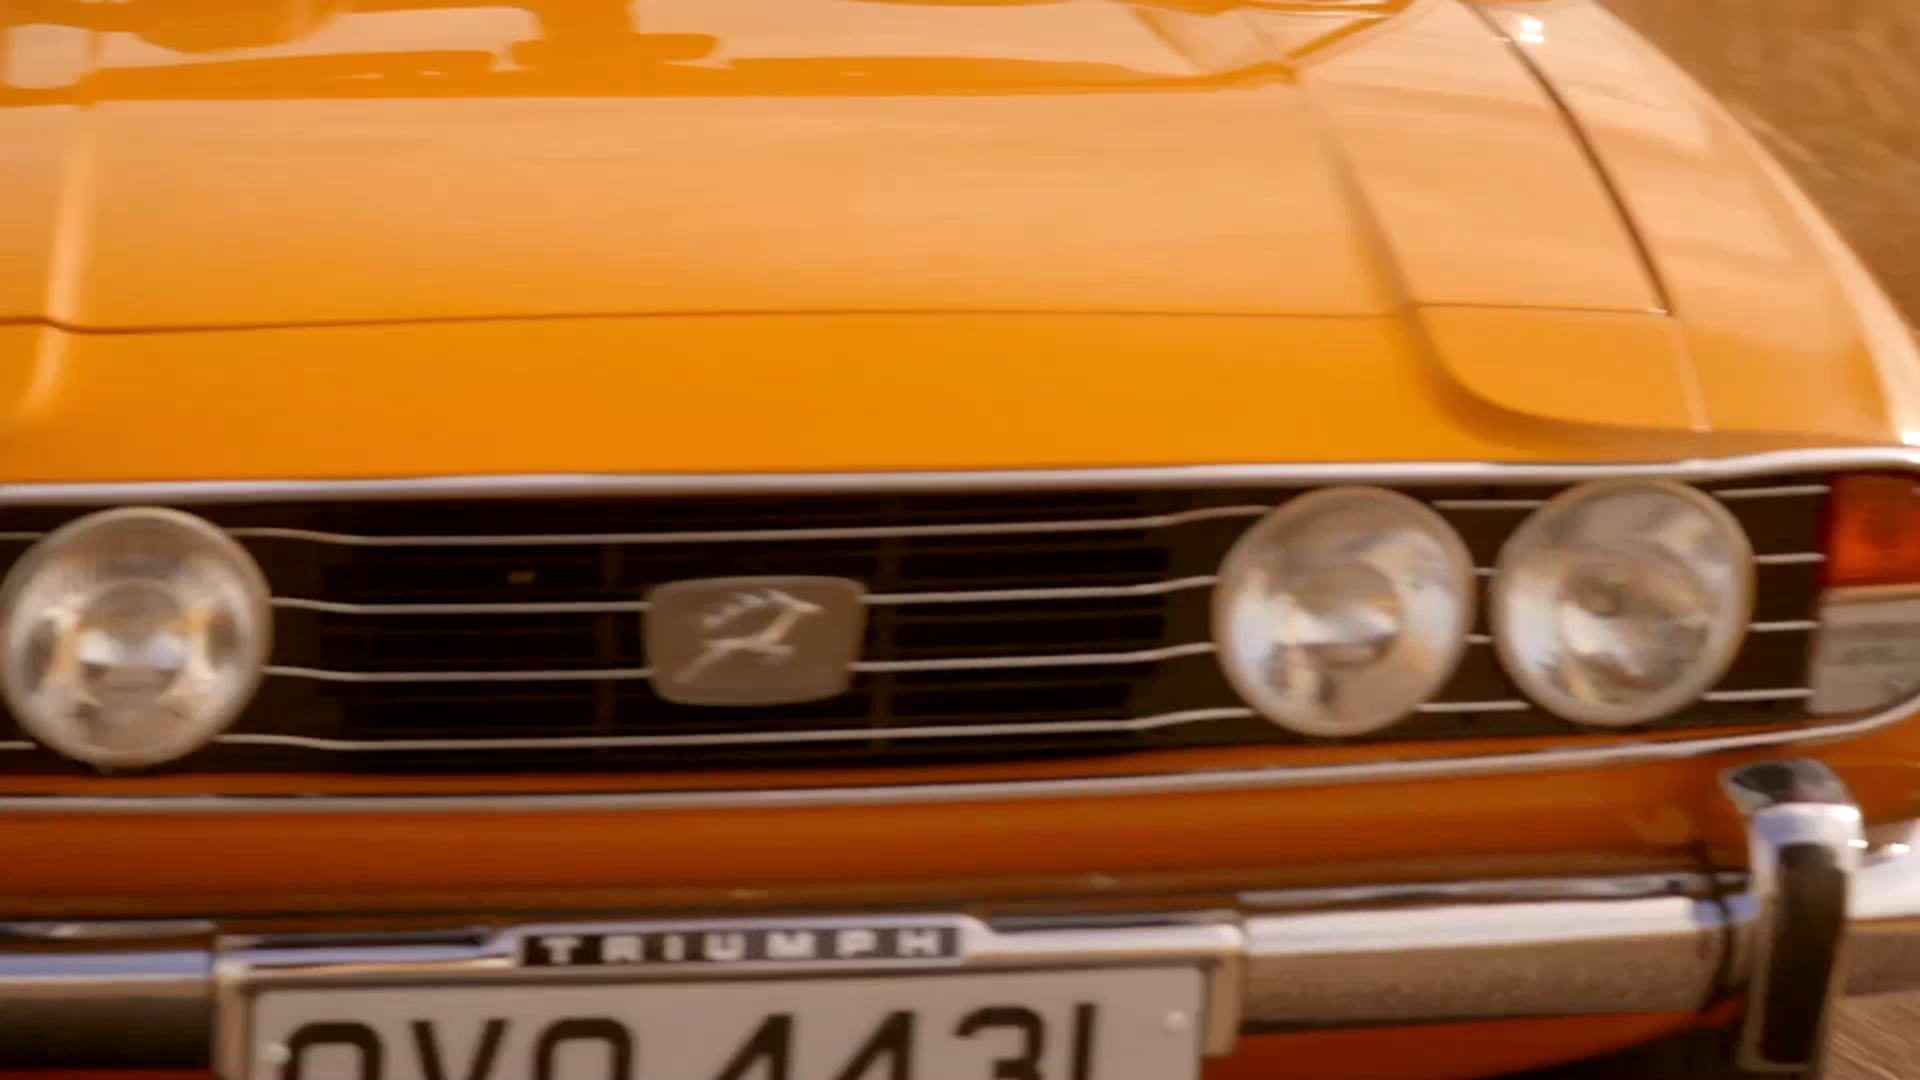 The Classic Car Show - Triumph Stag